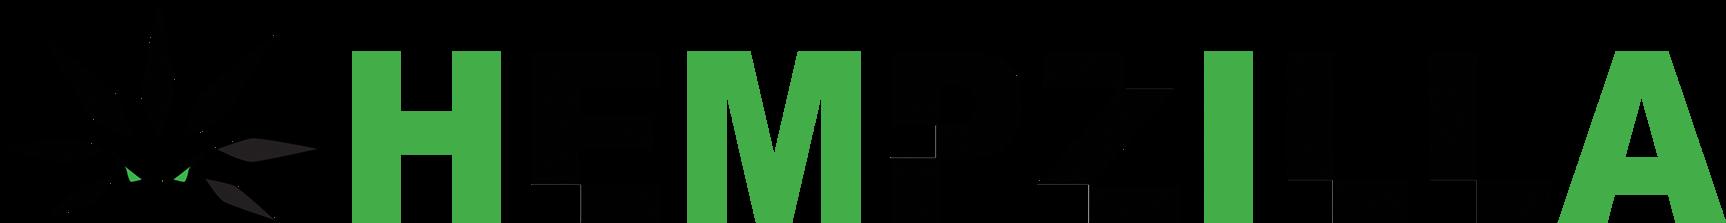 hempzilla-beast-logo-2-edit.png